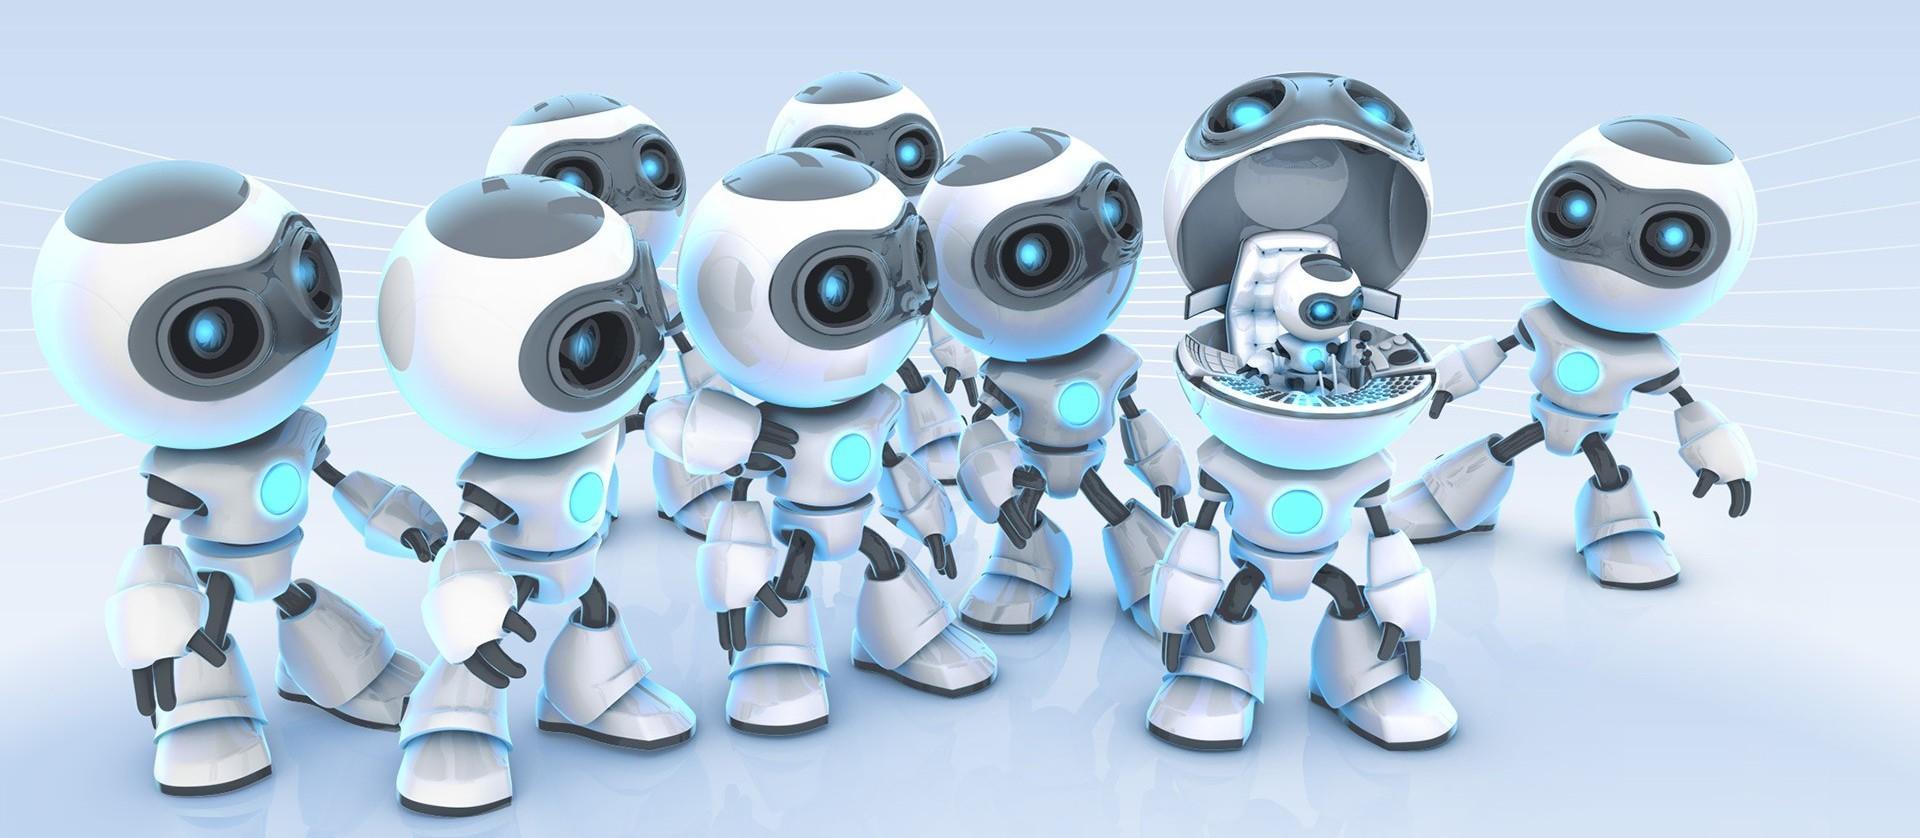 history of robots